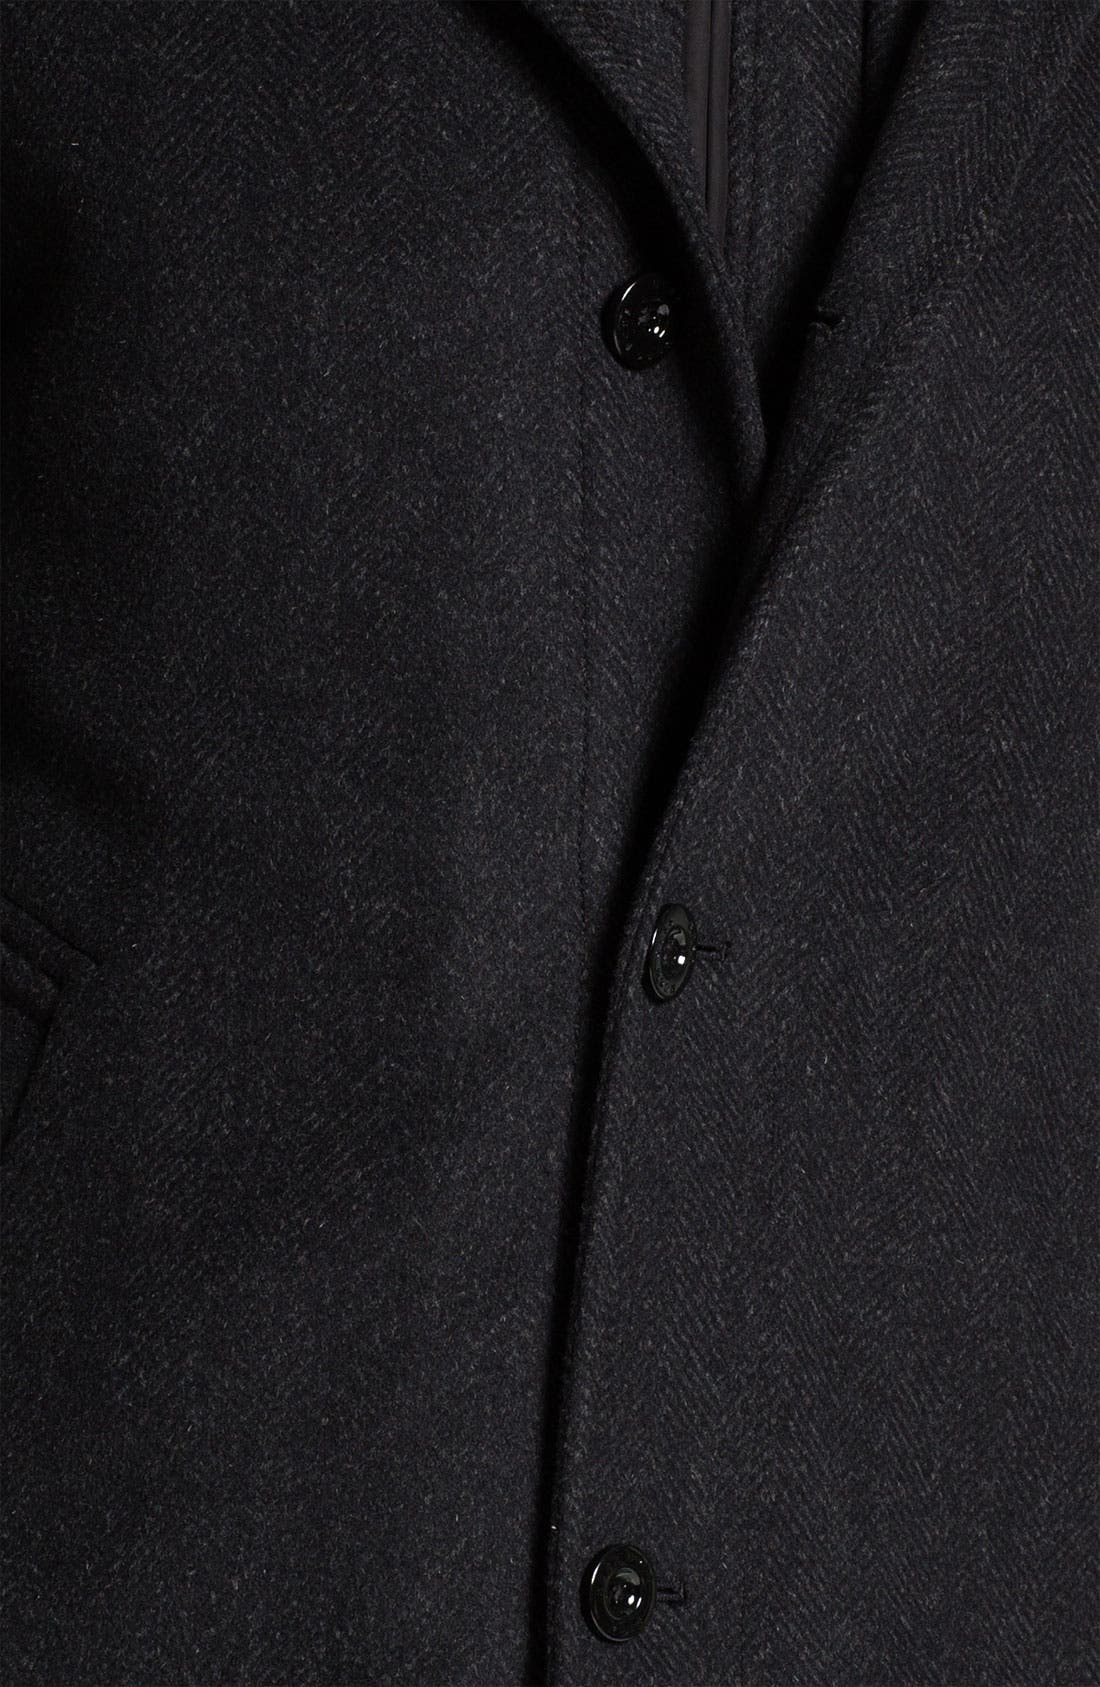 HUGO BOSS 'Coxtan' Wool & Cashmere Coat,                             Alternate thumbnail 3, color,                             001